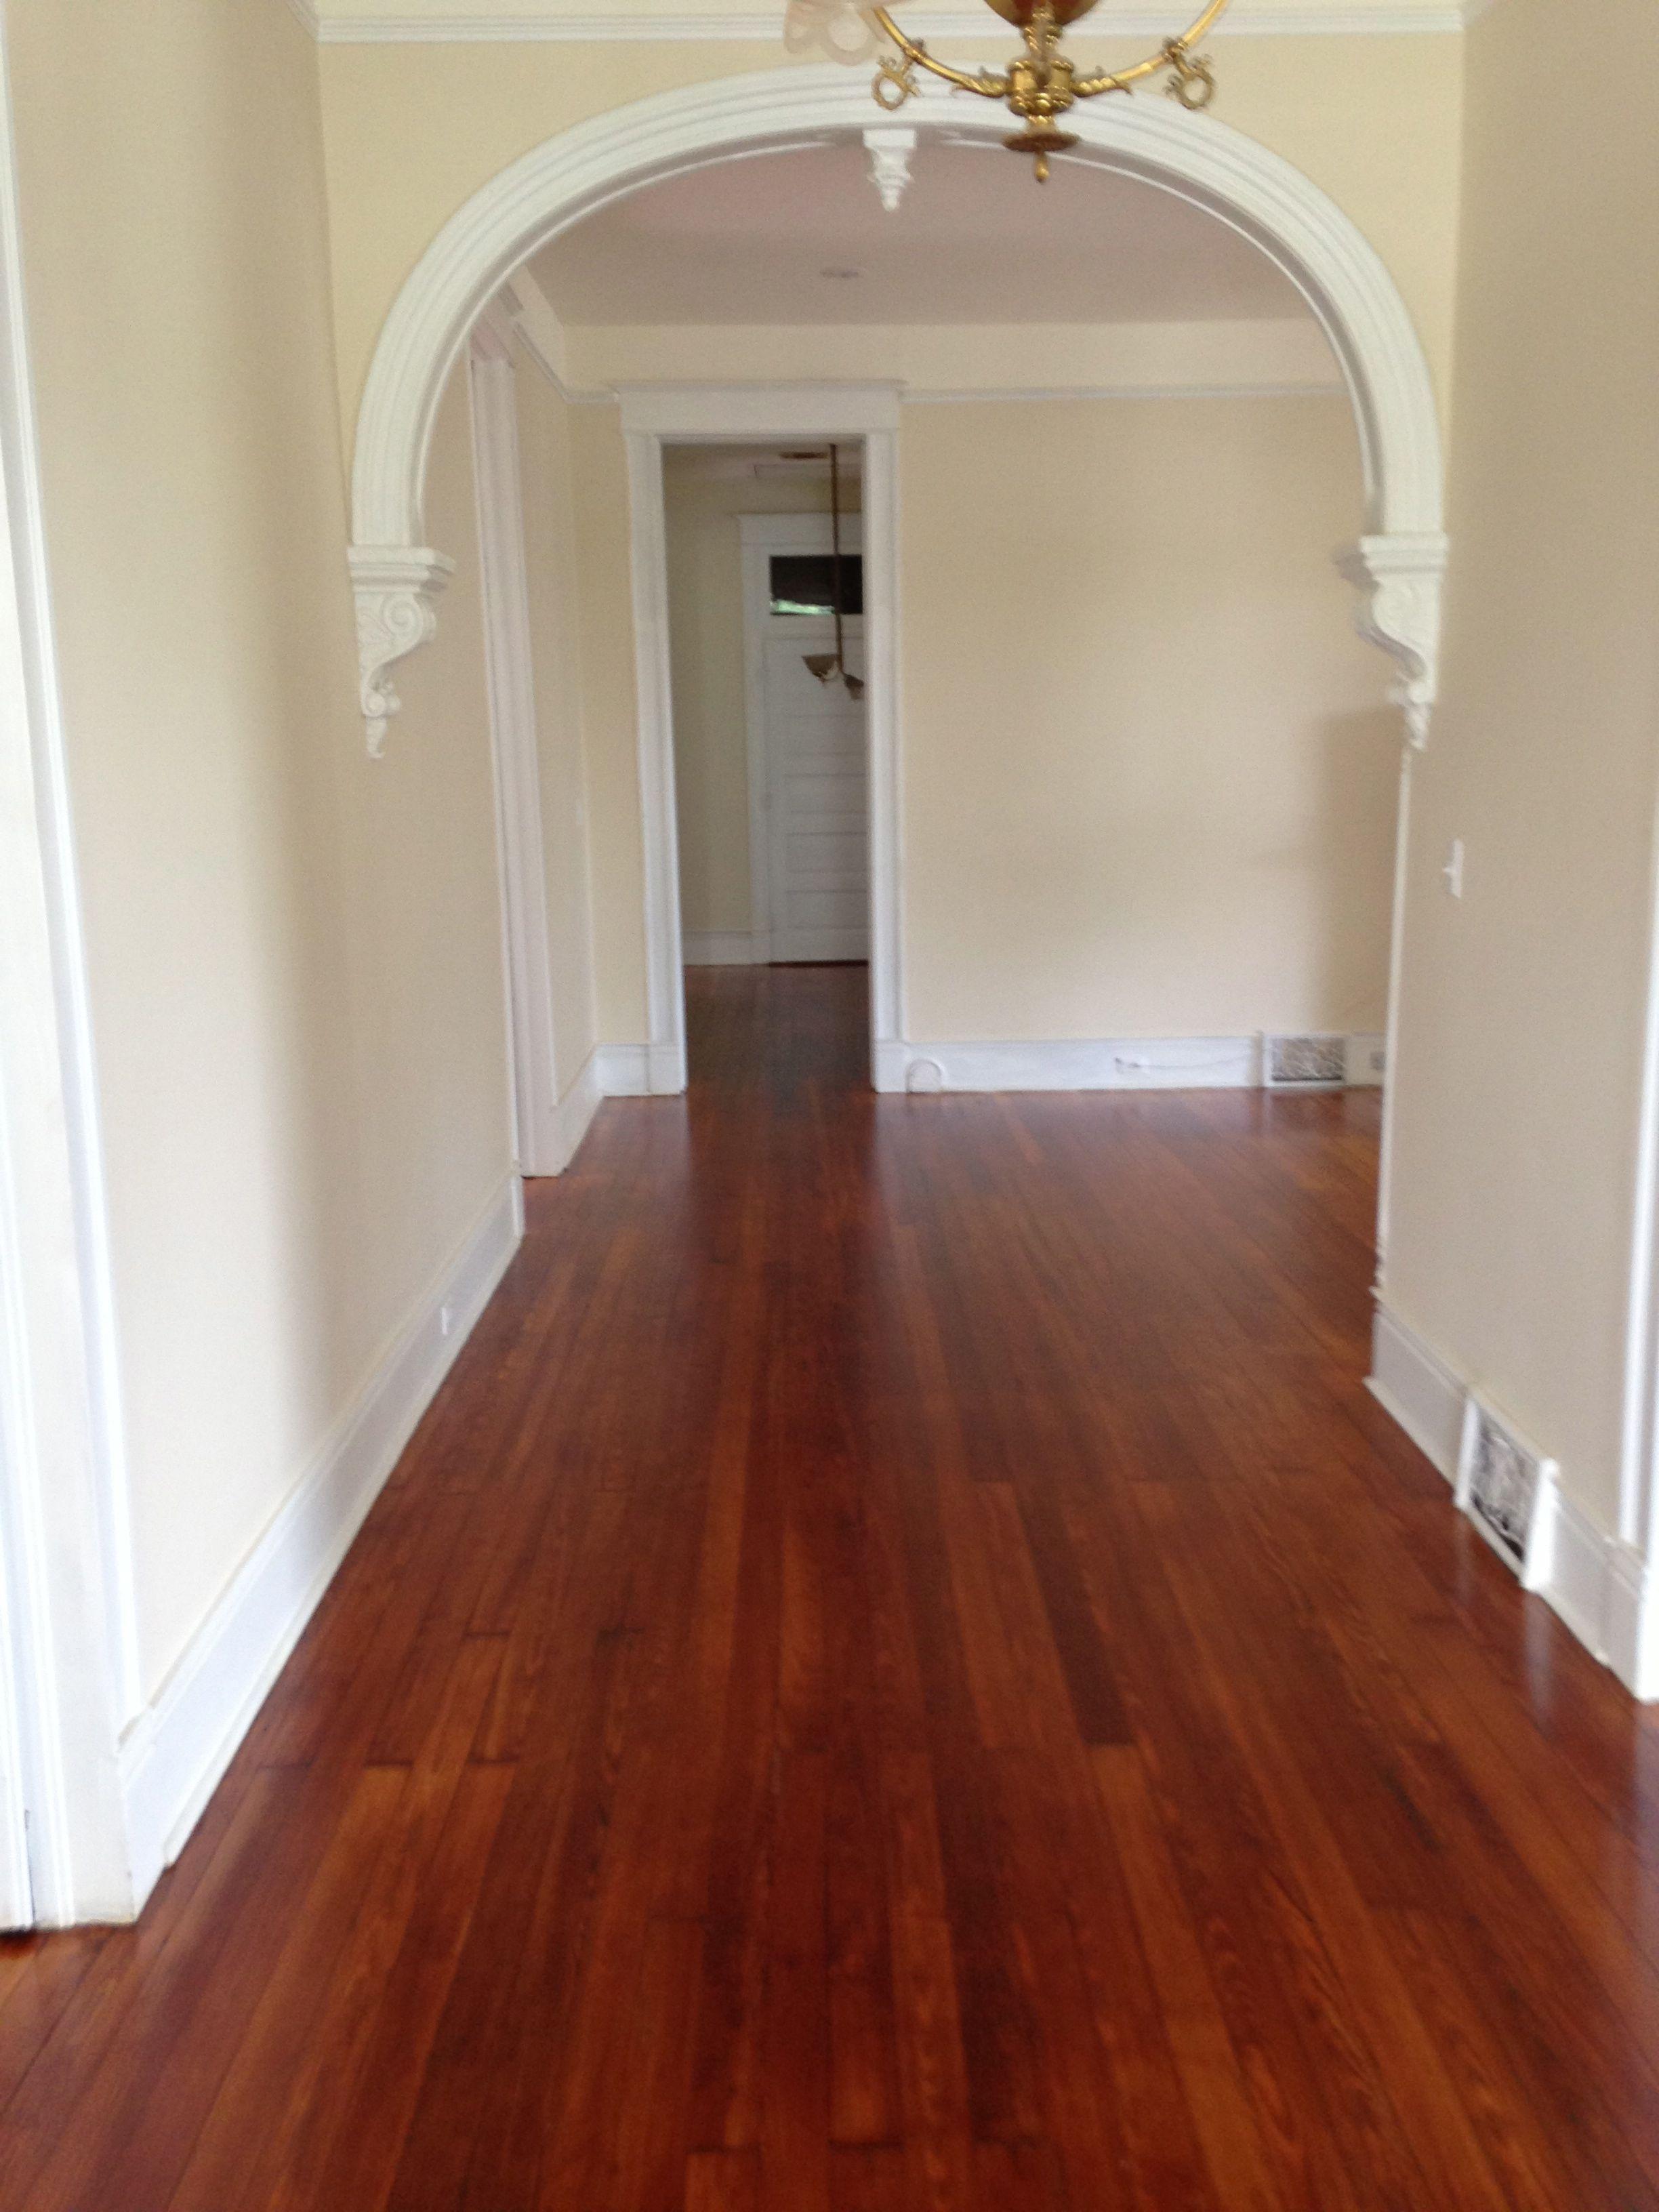 Polyurethaned hardwood floors in an arched hallway